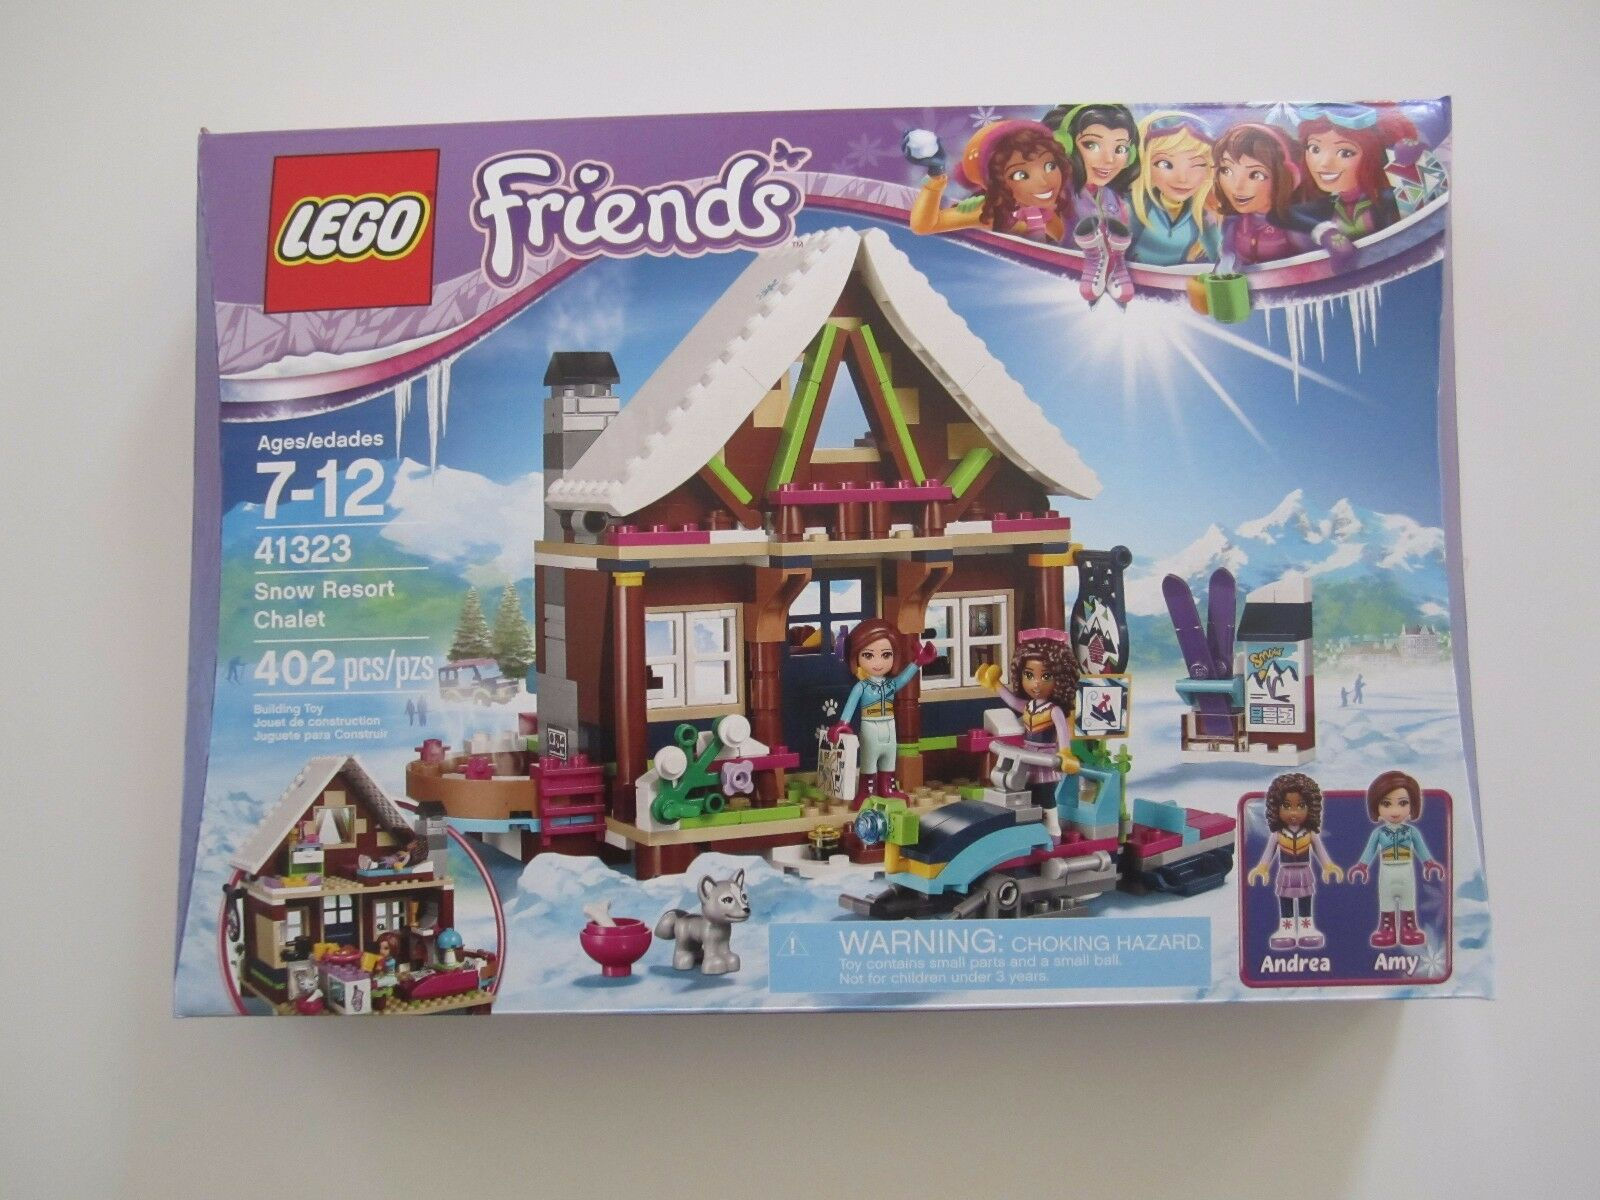 Lego Friends Snow Resort Chalet 41323 Building Kit (402 Piece) 9